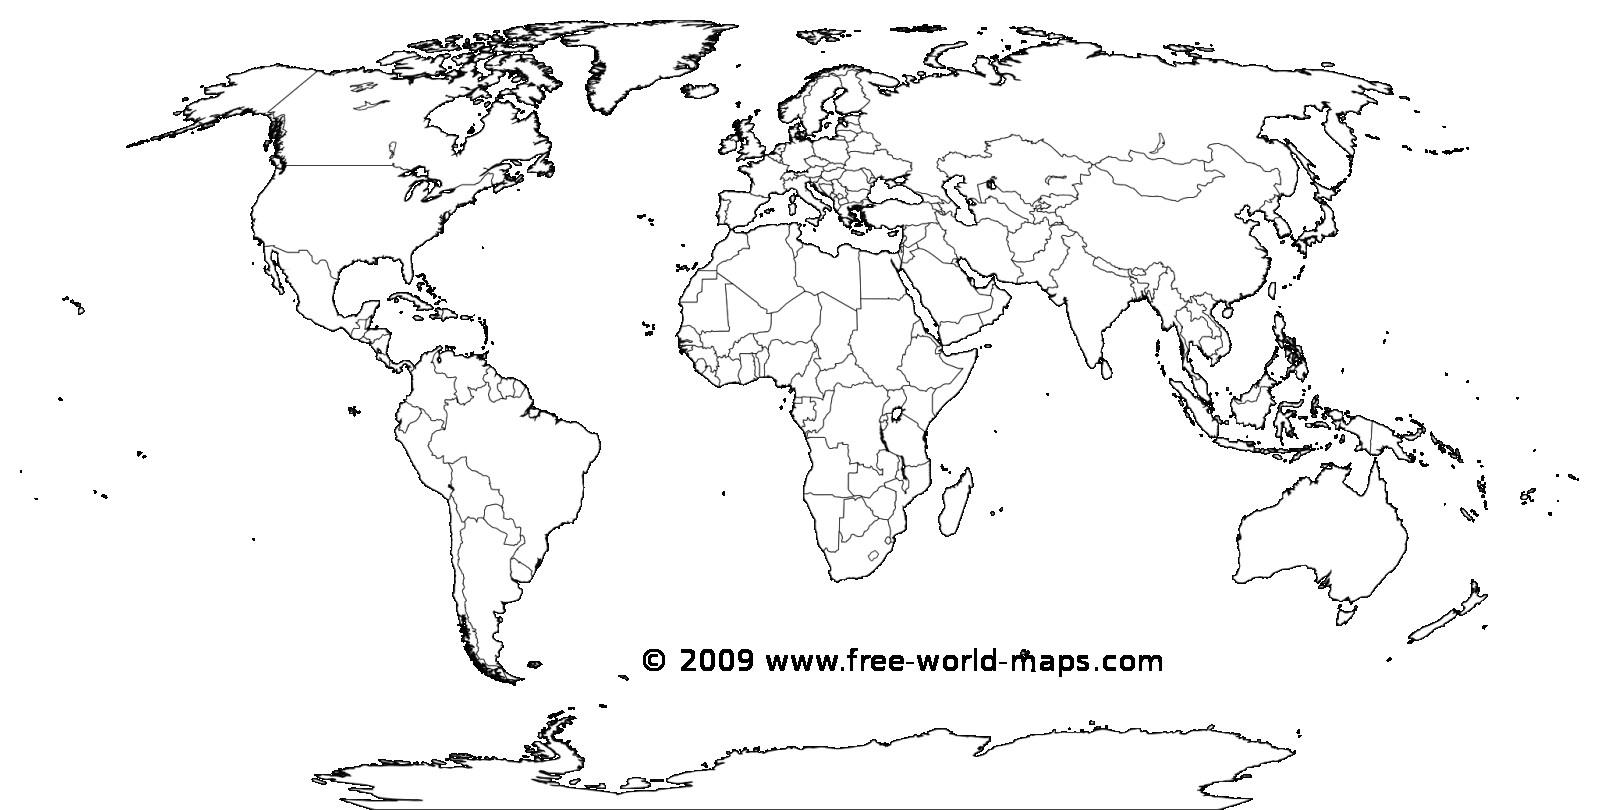 Printable World Map Free - Maplewebandpc - Free Printable Blank World Map Download